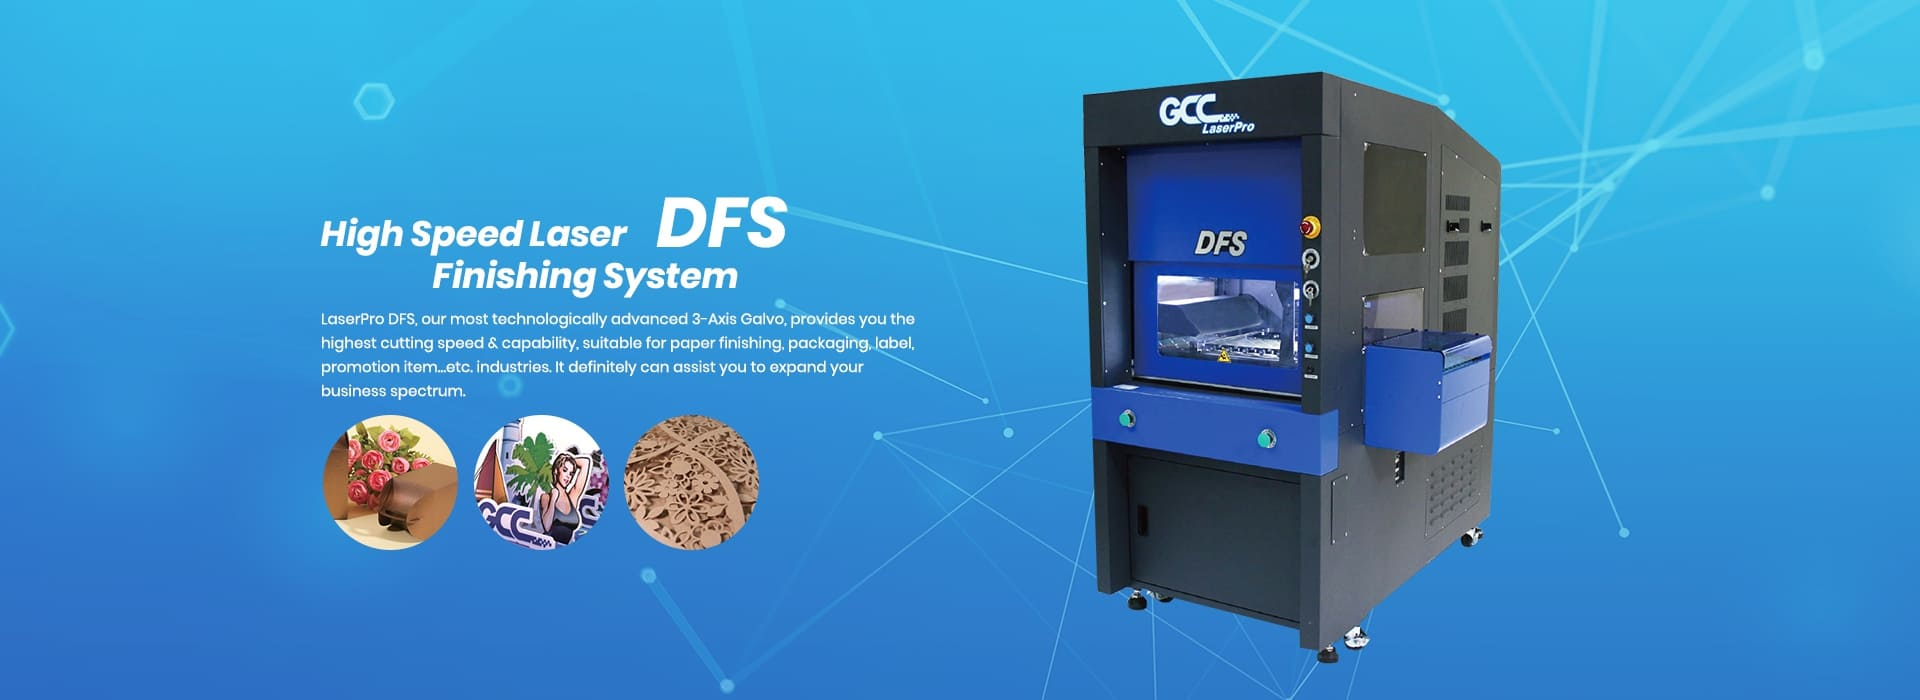 GCC DFS 提供於印刷產品的高速雷射系統